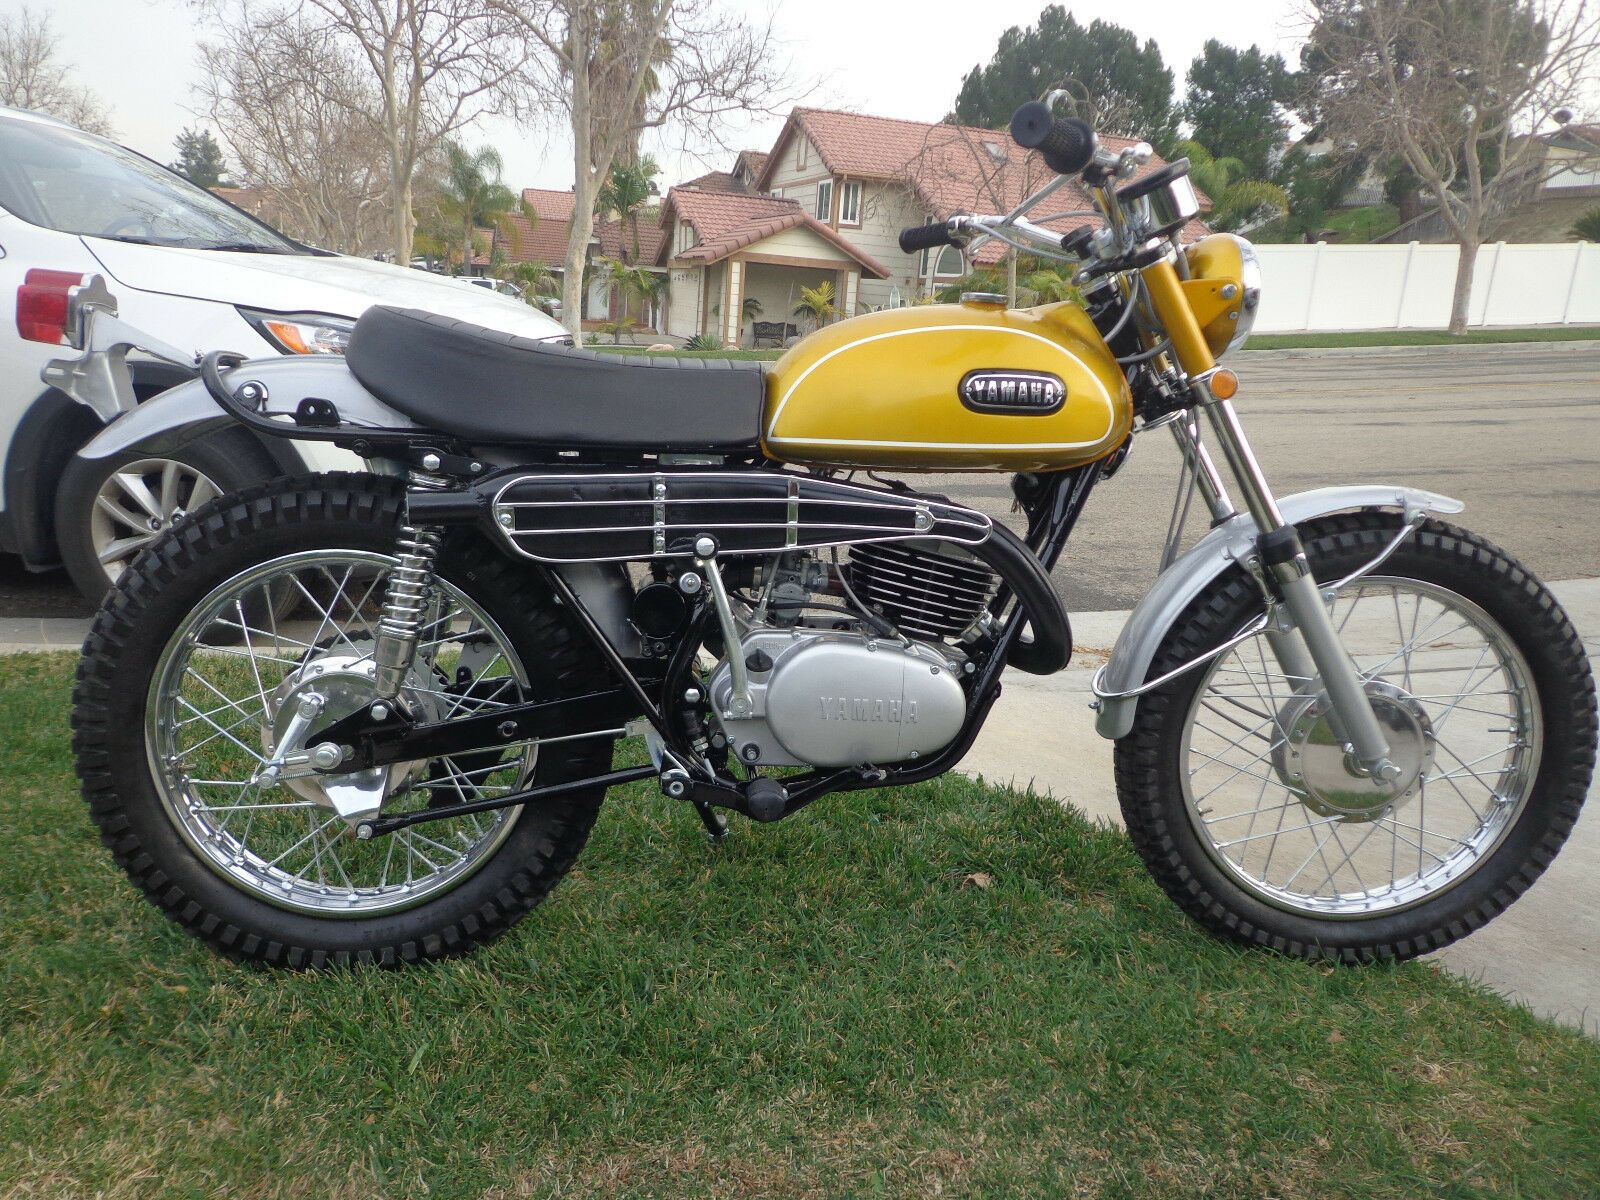 1969 Yamaha Dt1 250 Enduro Yamaha Motorcycles For Sale Motorcycle